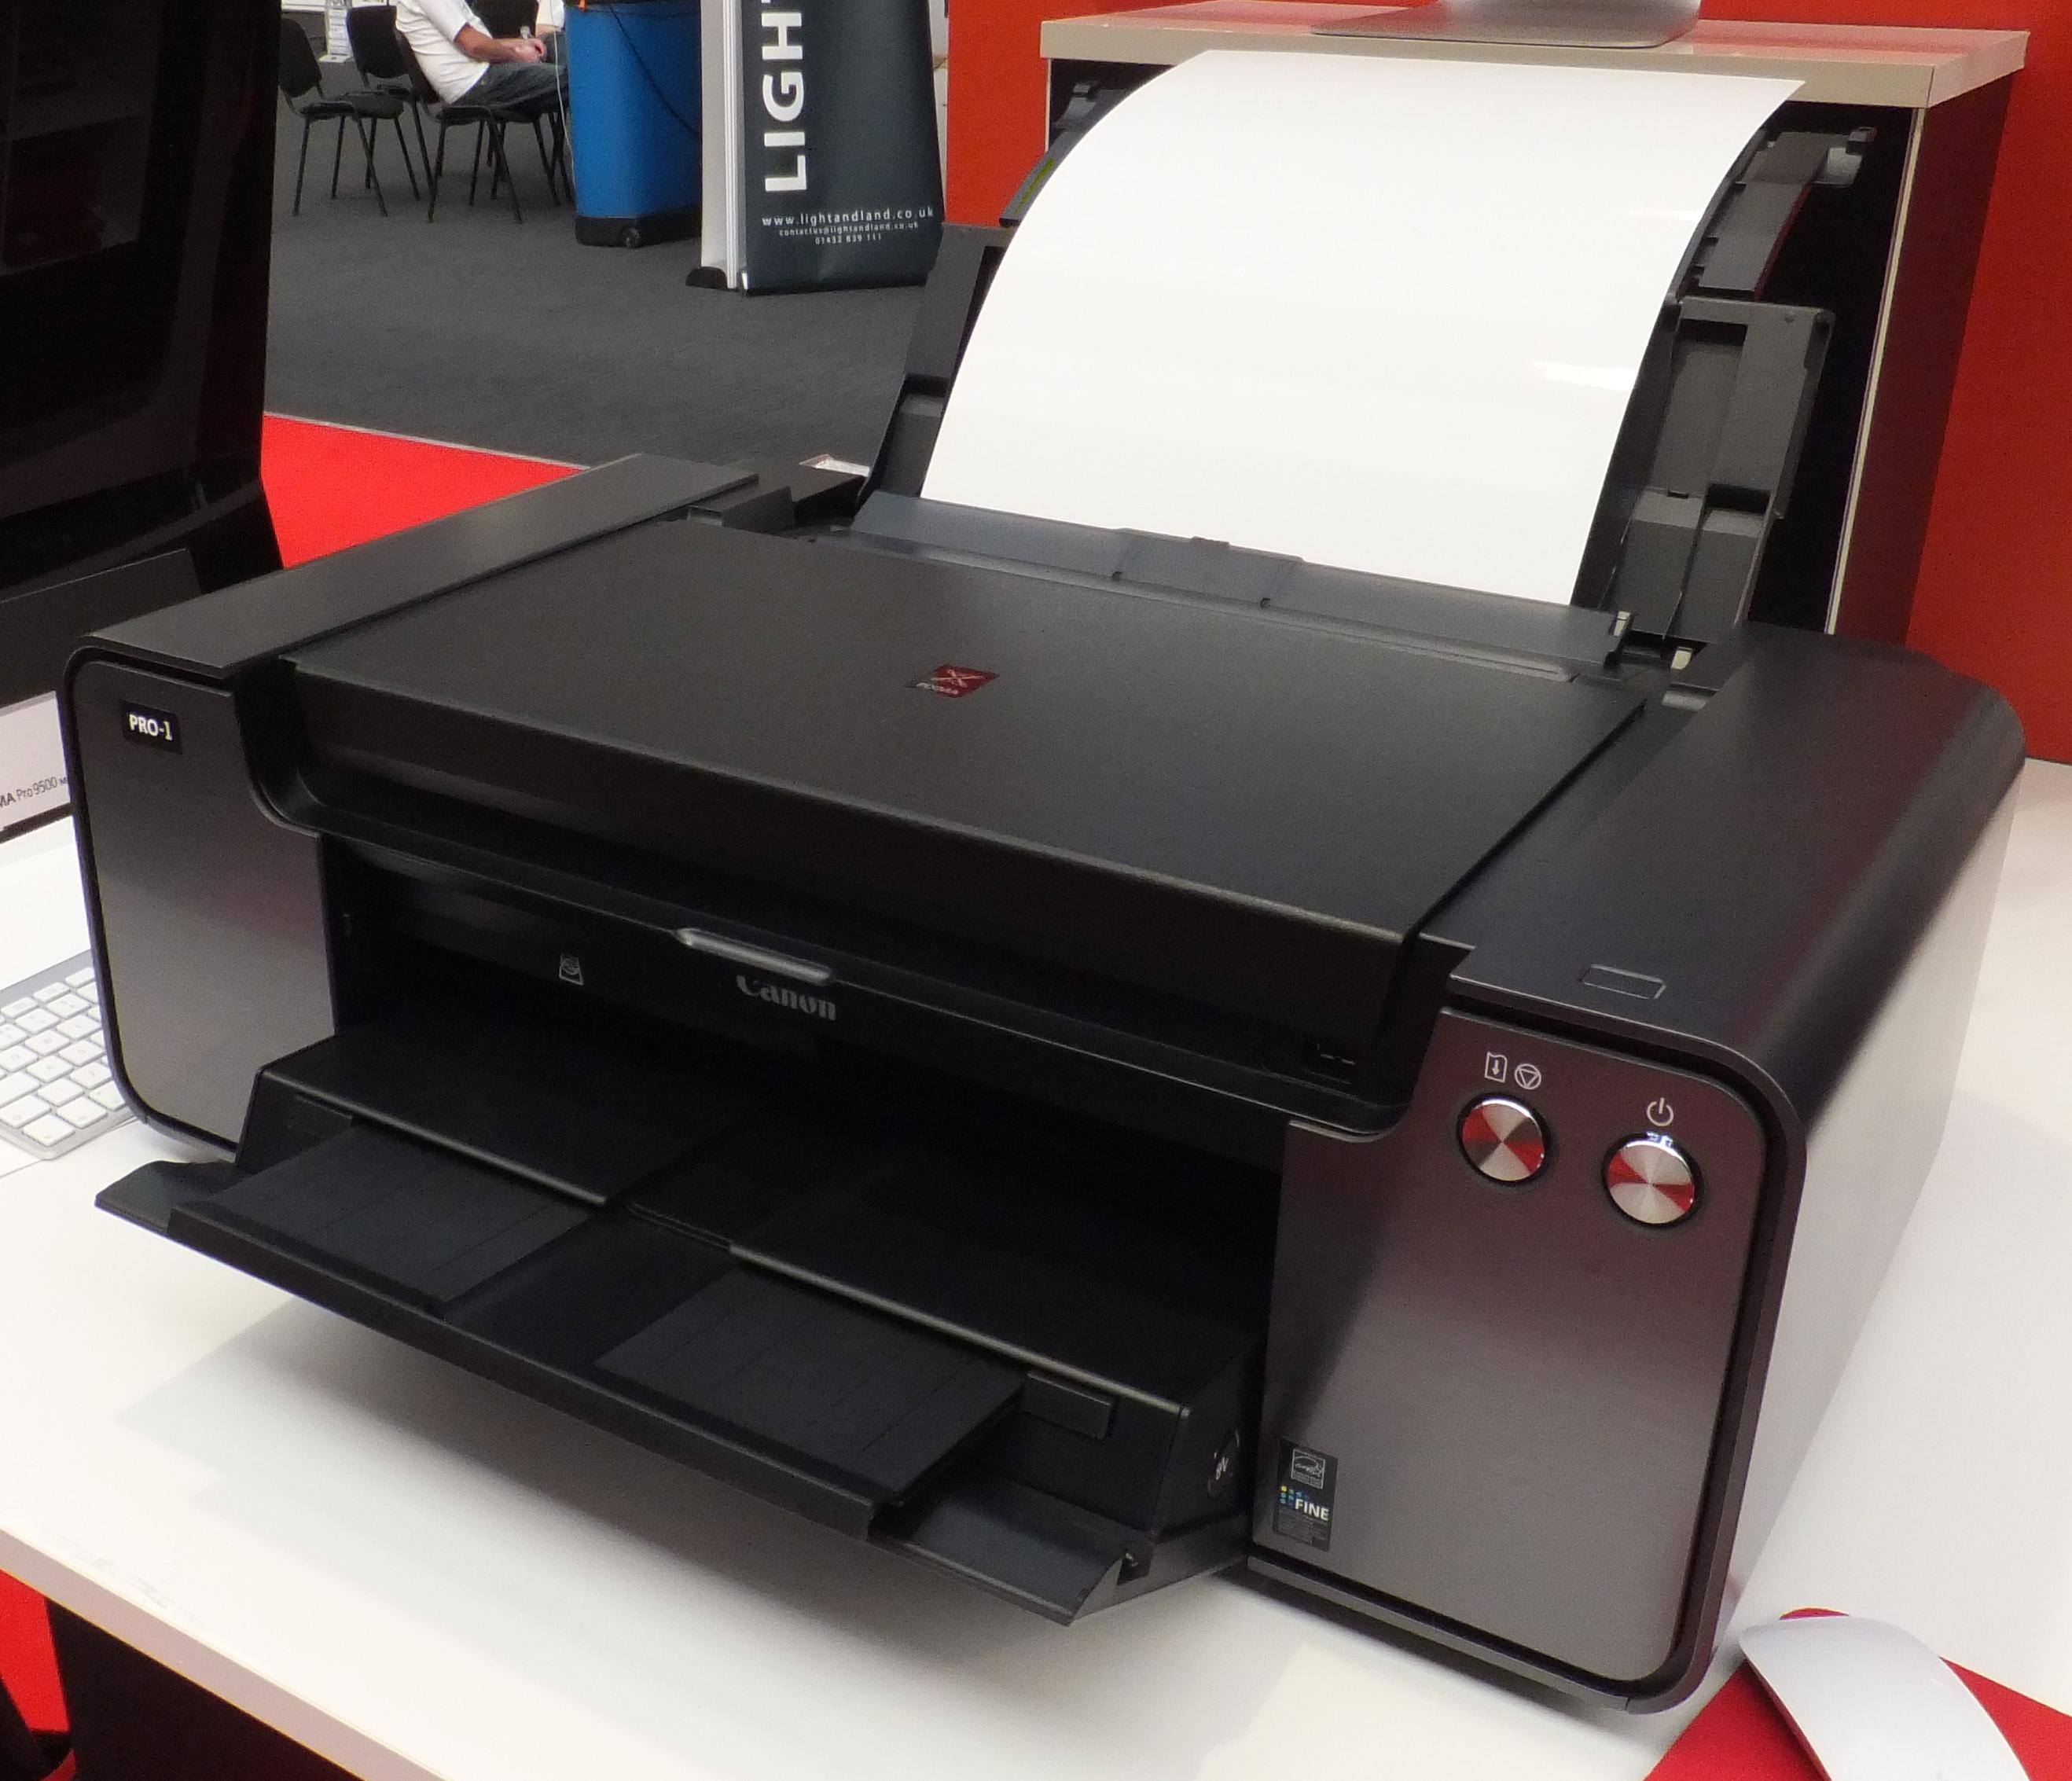 Canon PIXMA Pro-1 A3+ Printer Hands-On